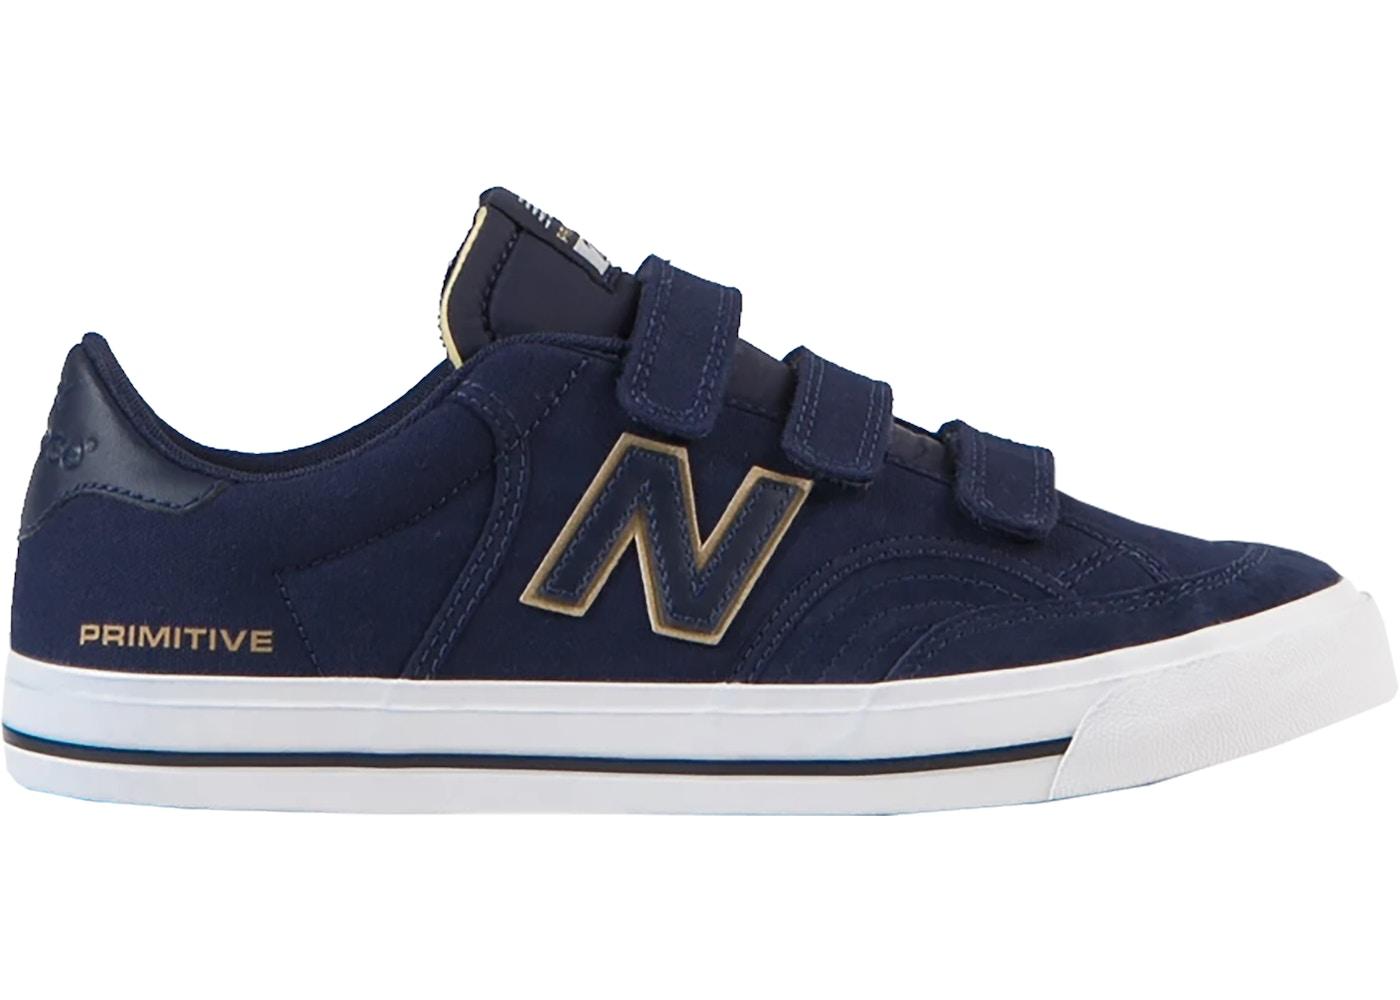 New Balance Numeric 212 Primitive - Sneakers